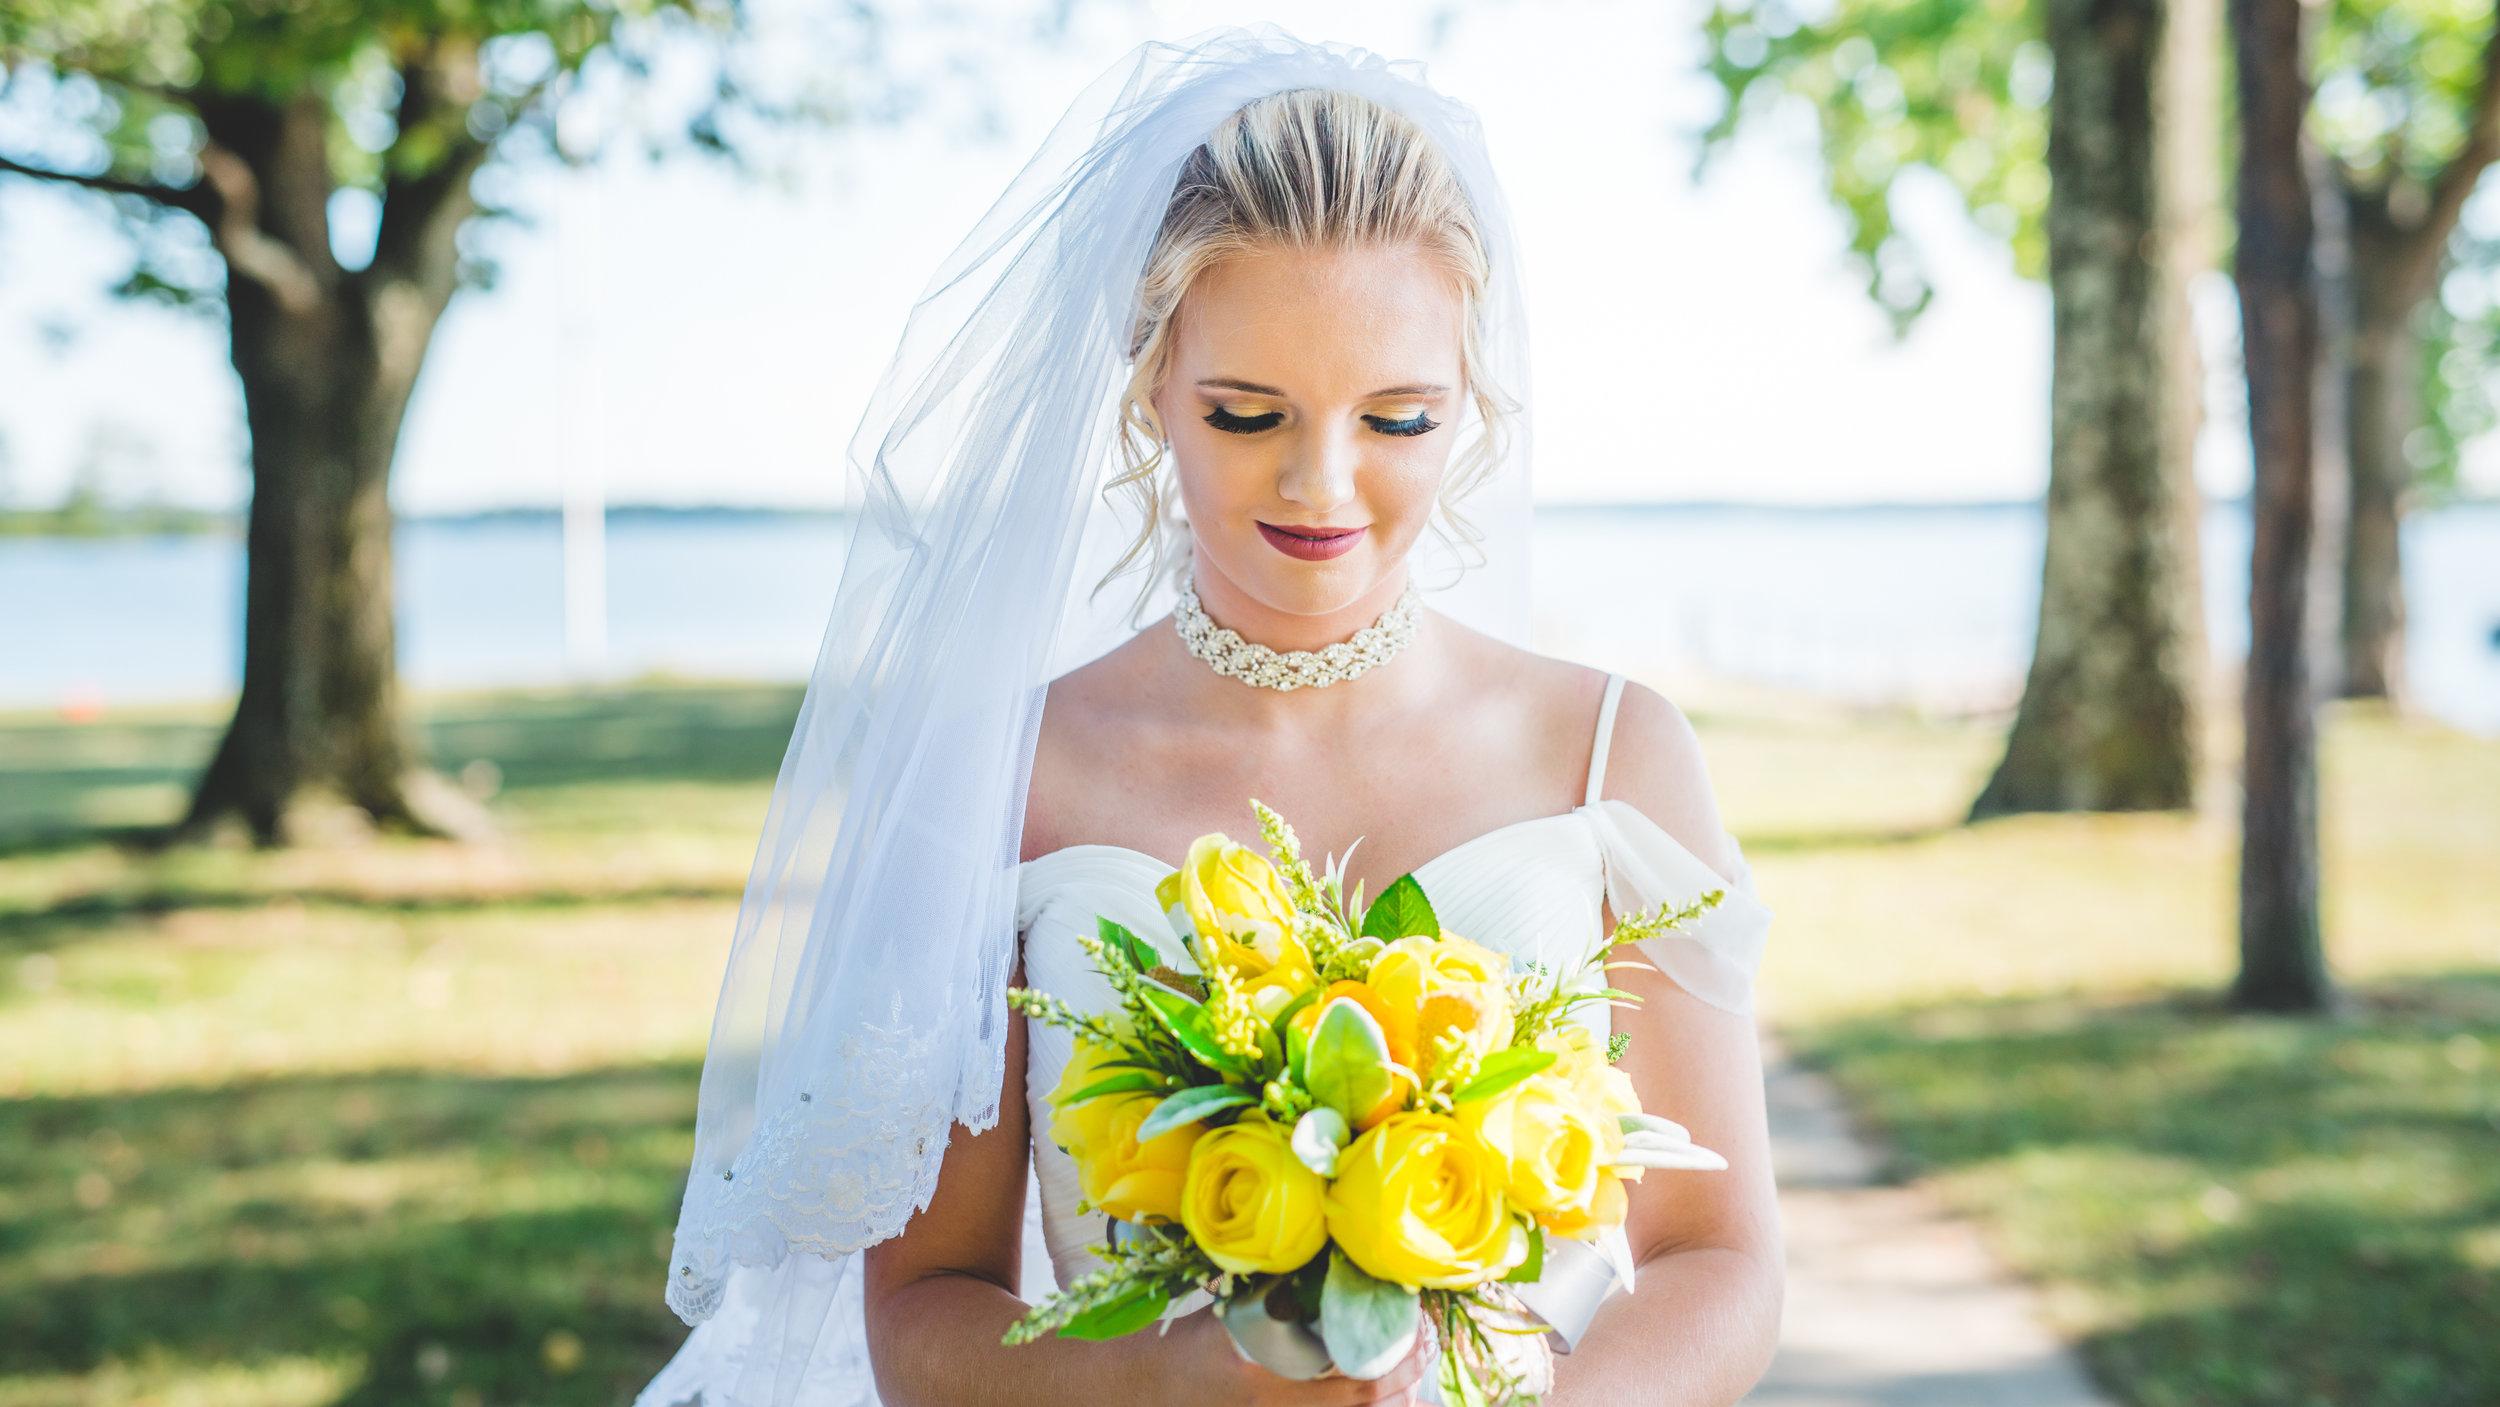 CCW - Creative Cure Weddings - Peyton and Alex - Southern Illinois Wedding Photography-1.jpg